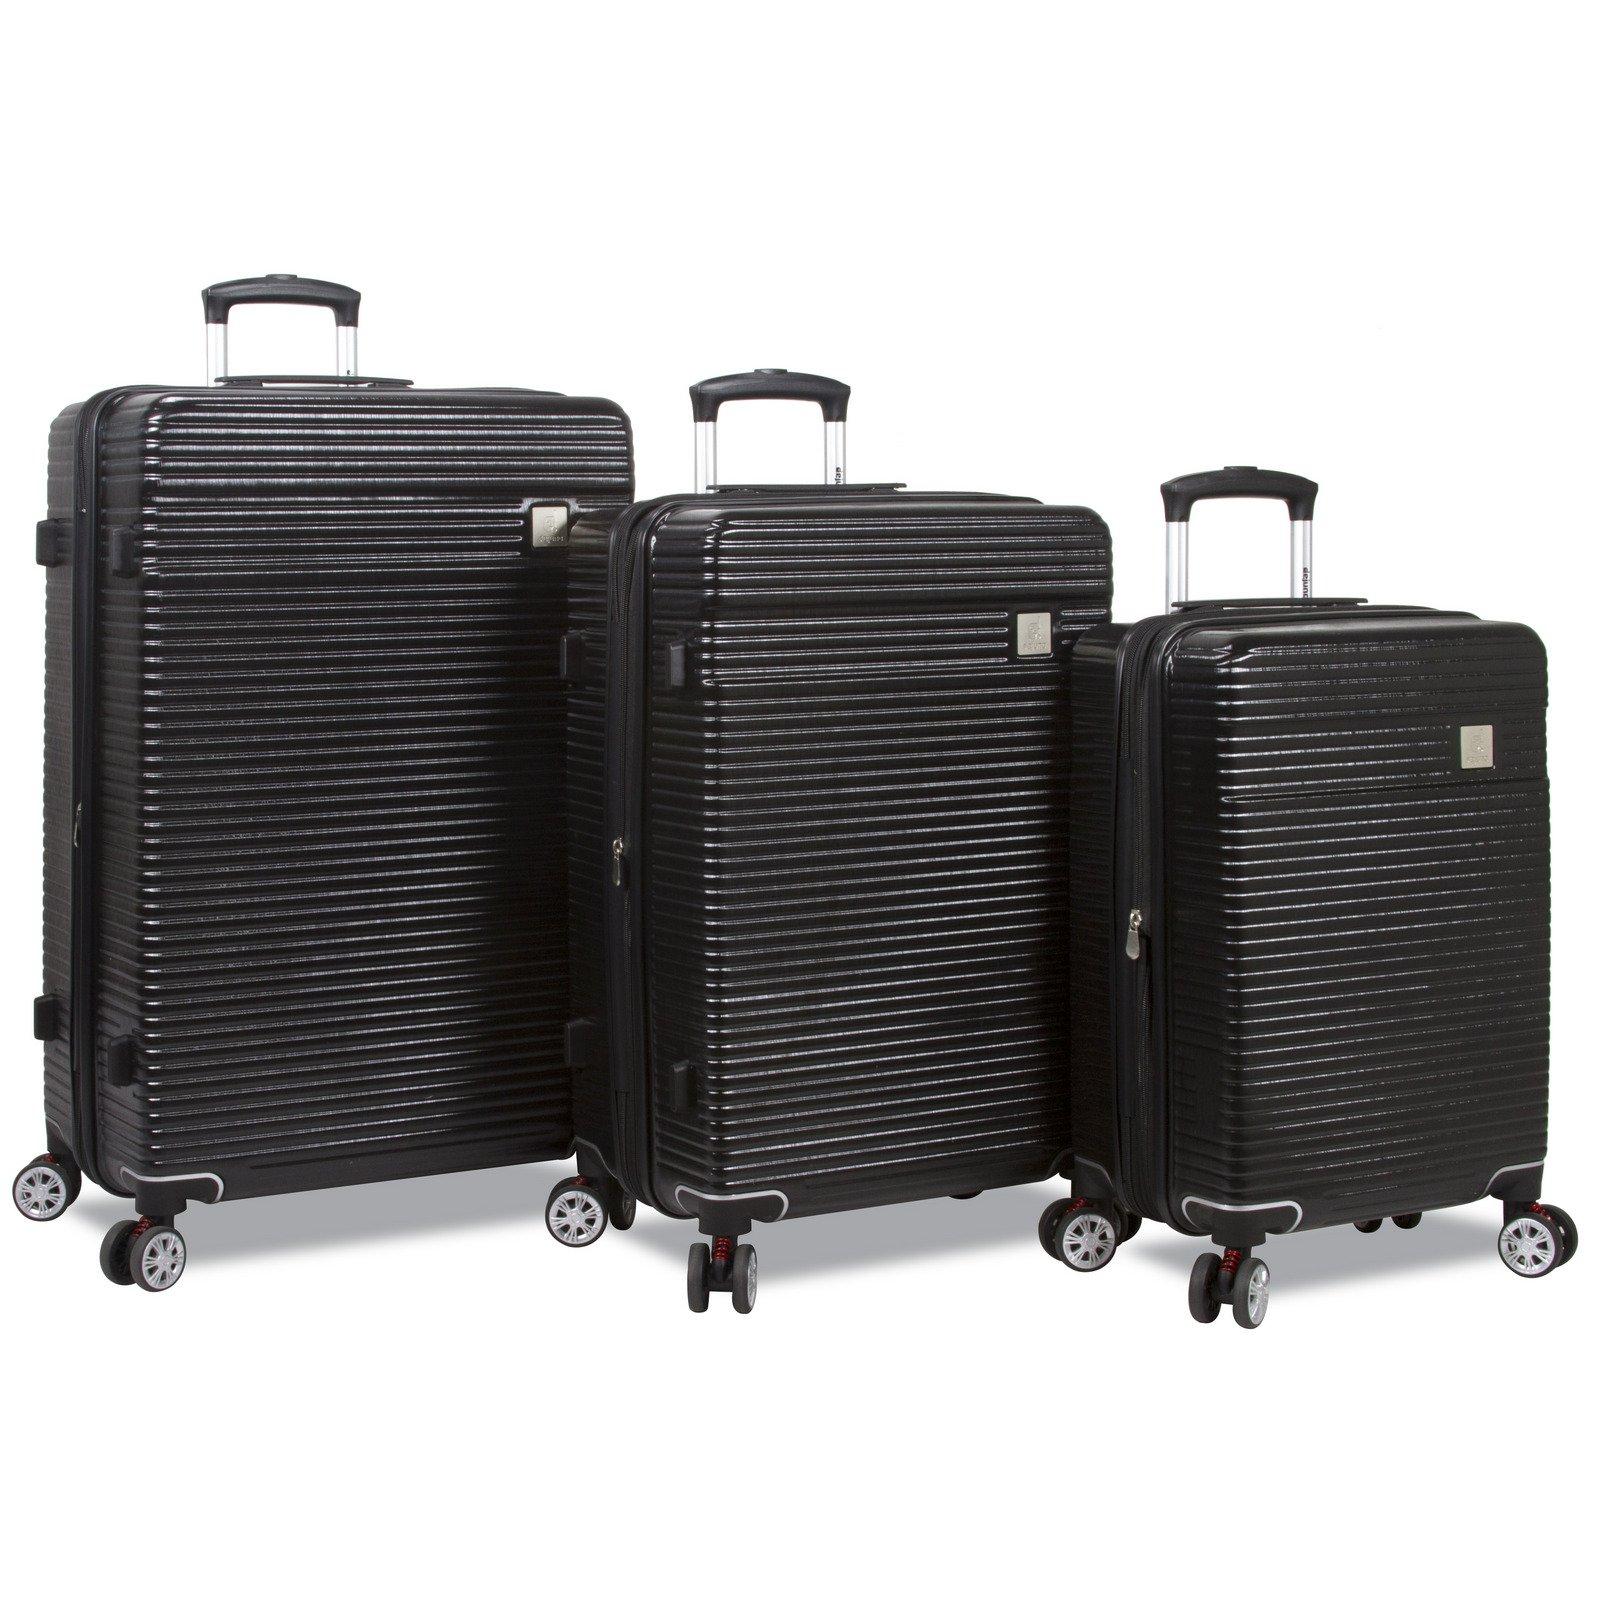 Dejuno Ashford 3-pc Hardside Spinner TSA Combination Lock Luggage Set-Black by Dejuno